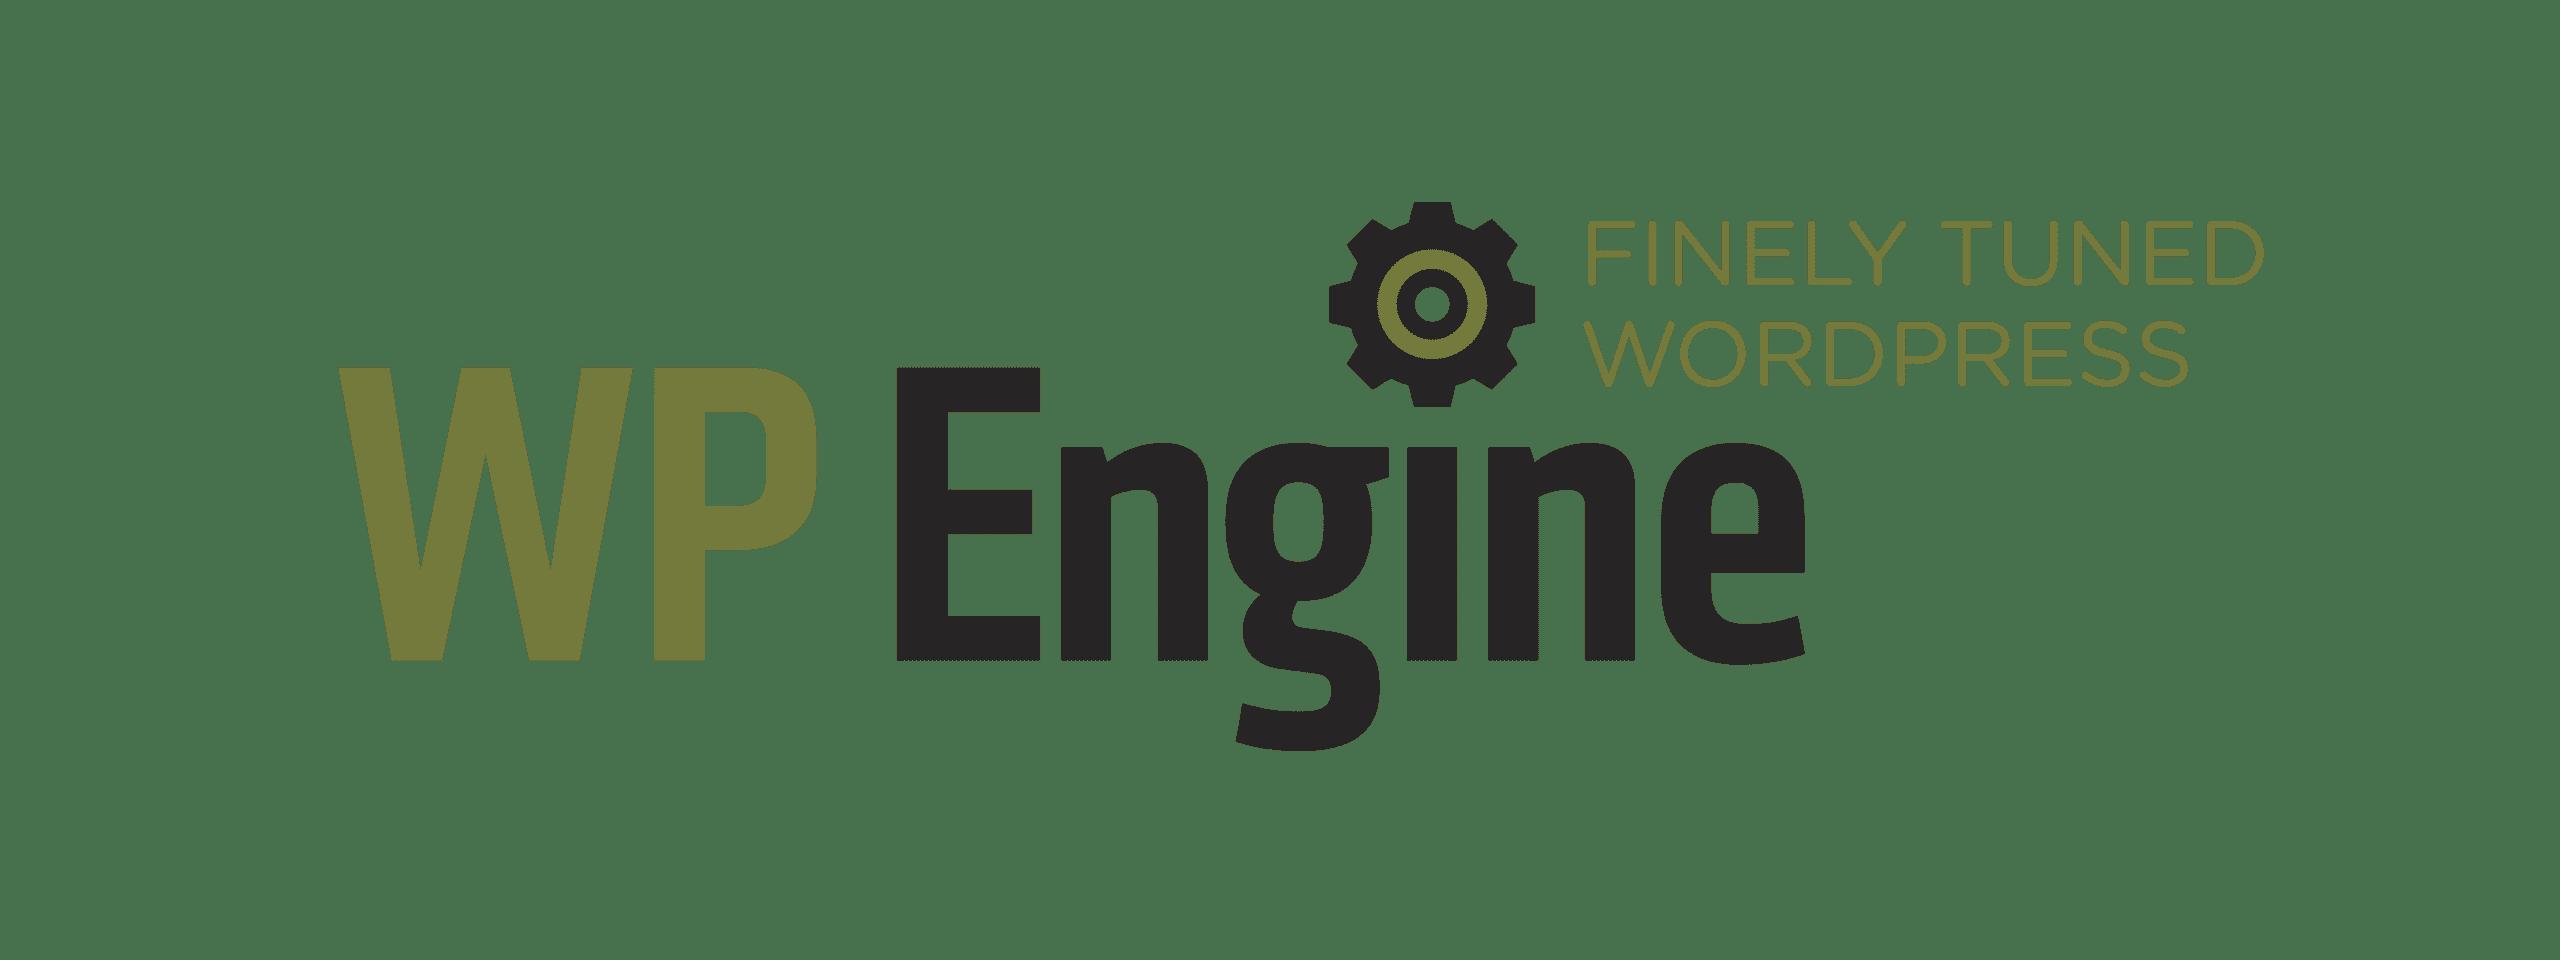 WP-Engine الإستضافات العالمية التي يمكنك منها ربح حتى 200 دولار للمبيعة الواحدة